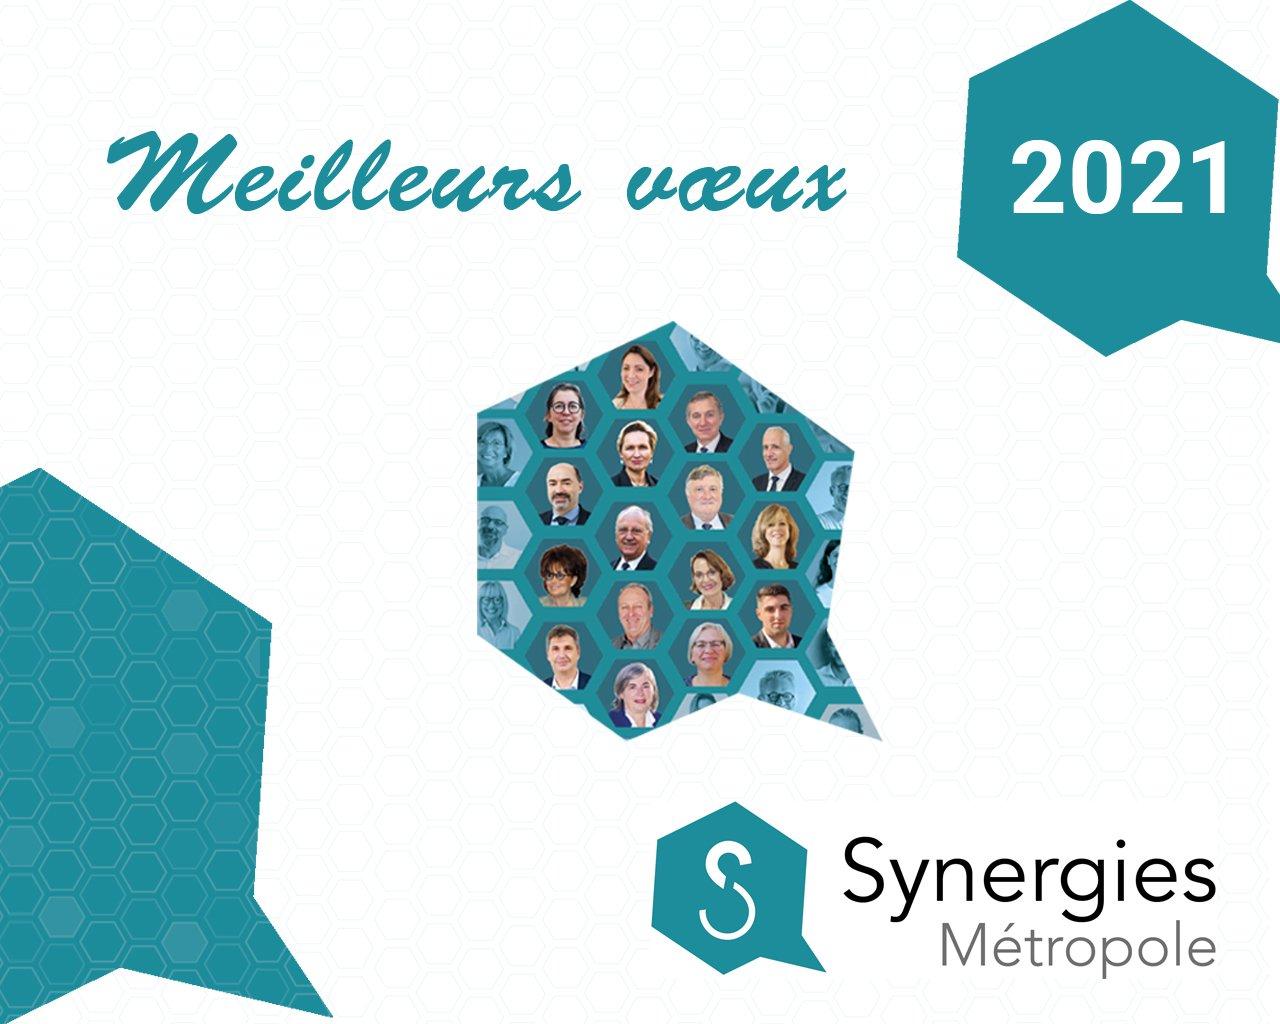 visuel voeux 2021